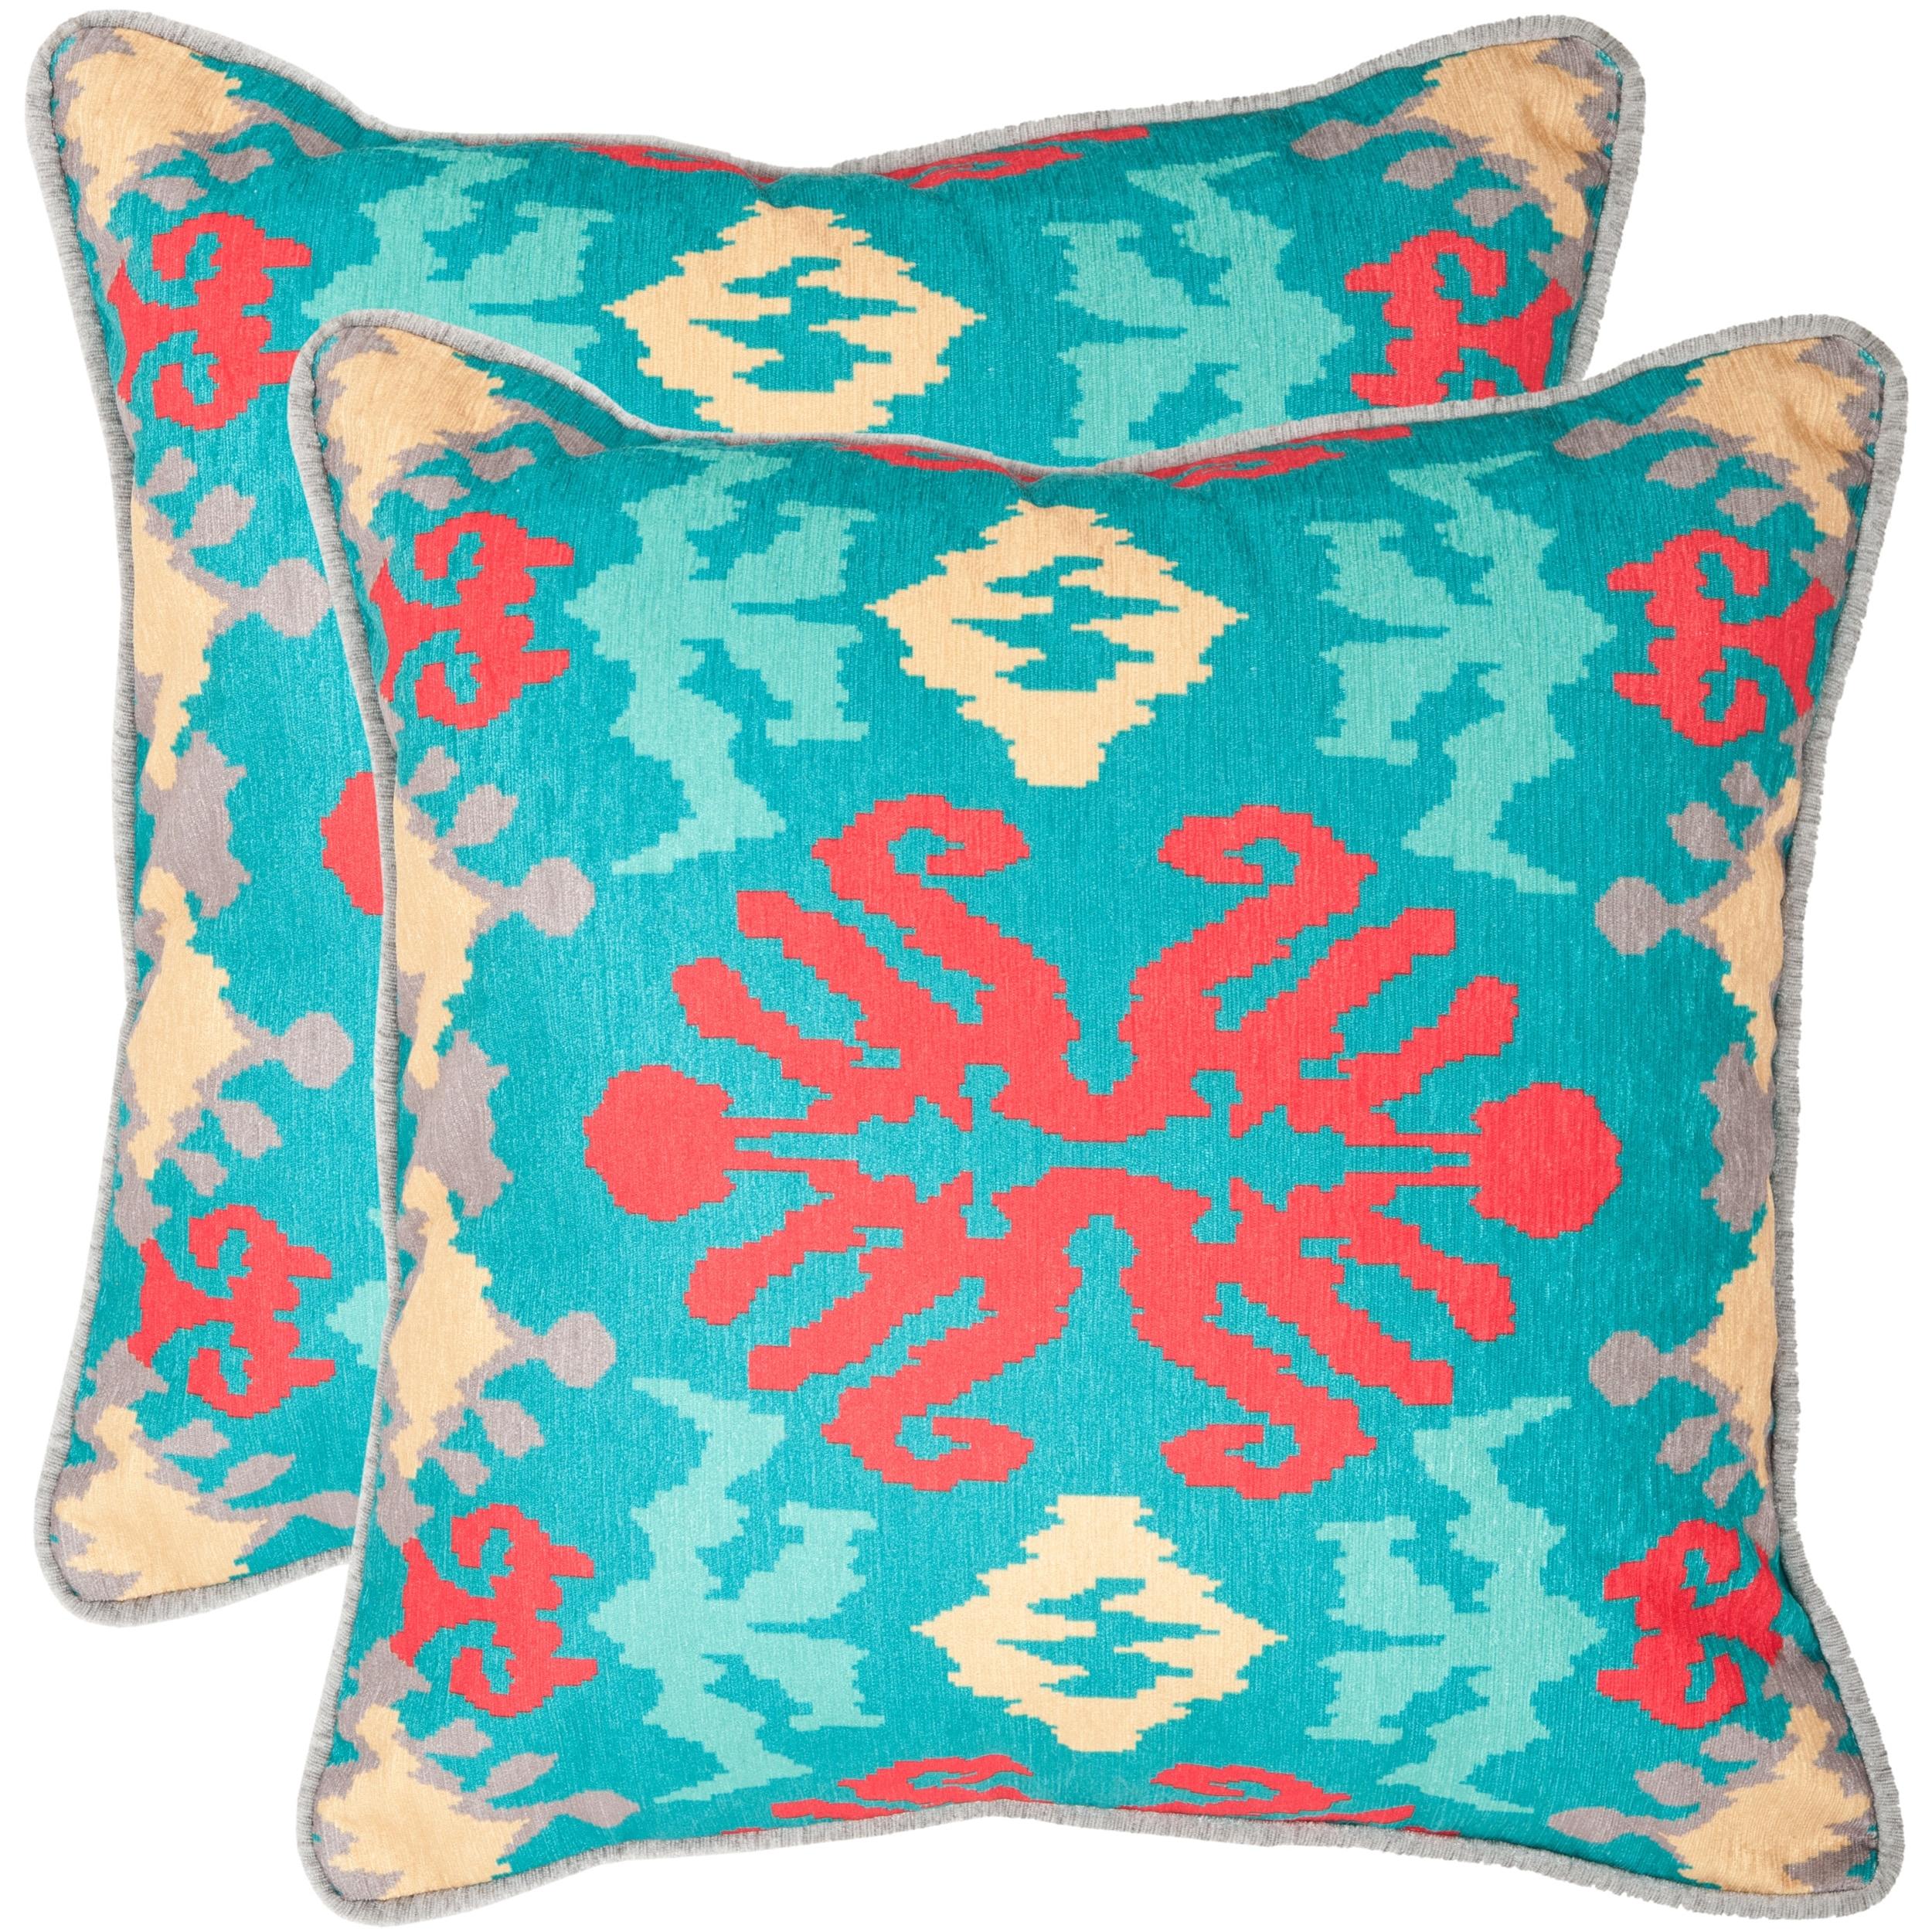 Safavieh Rye 20 Inch Aqua Blue Decorative Pillows Set Of 2 Overstock 7576236